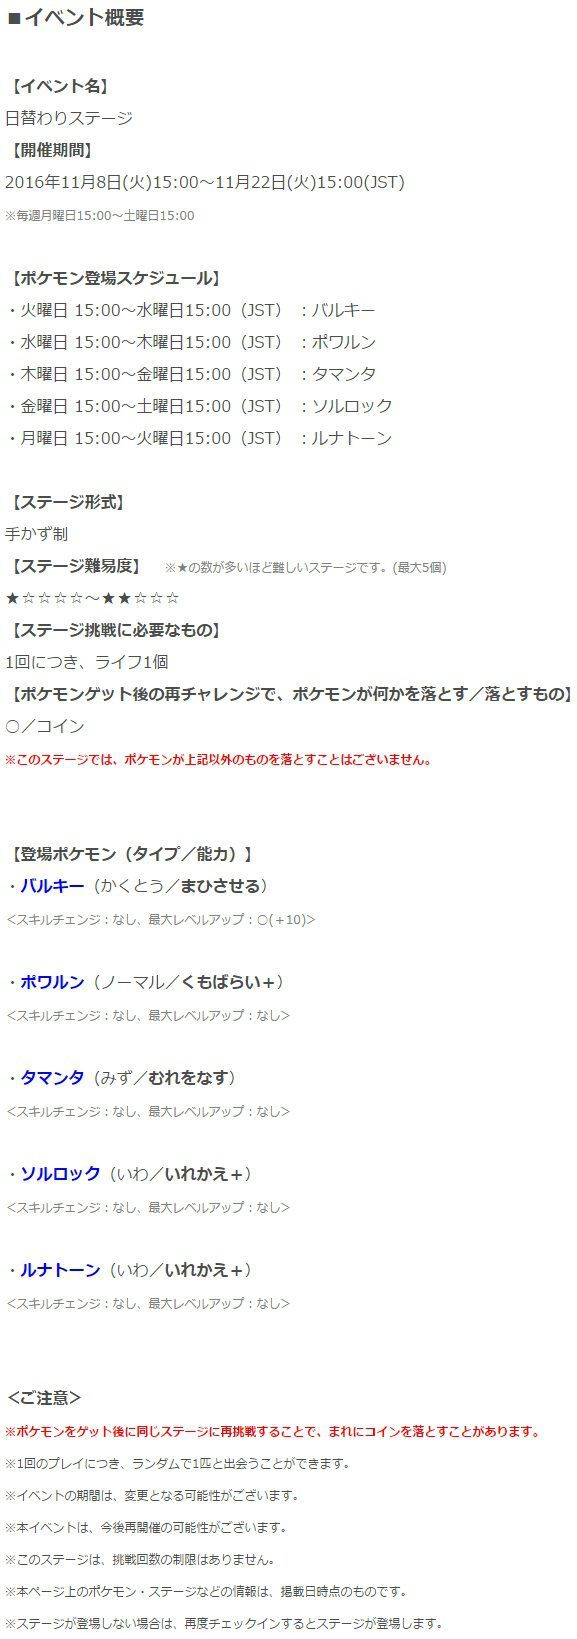 image_7035.jpg